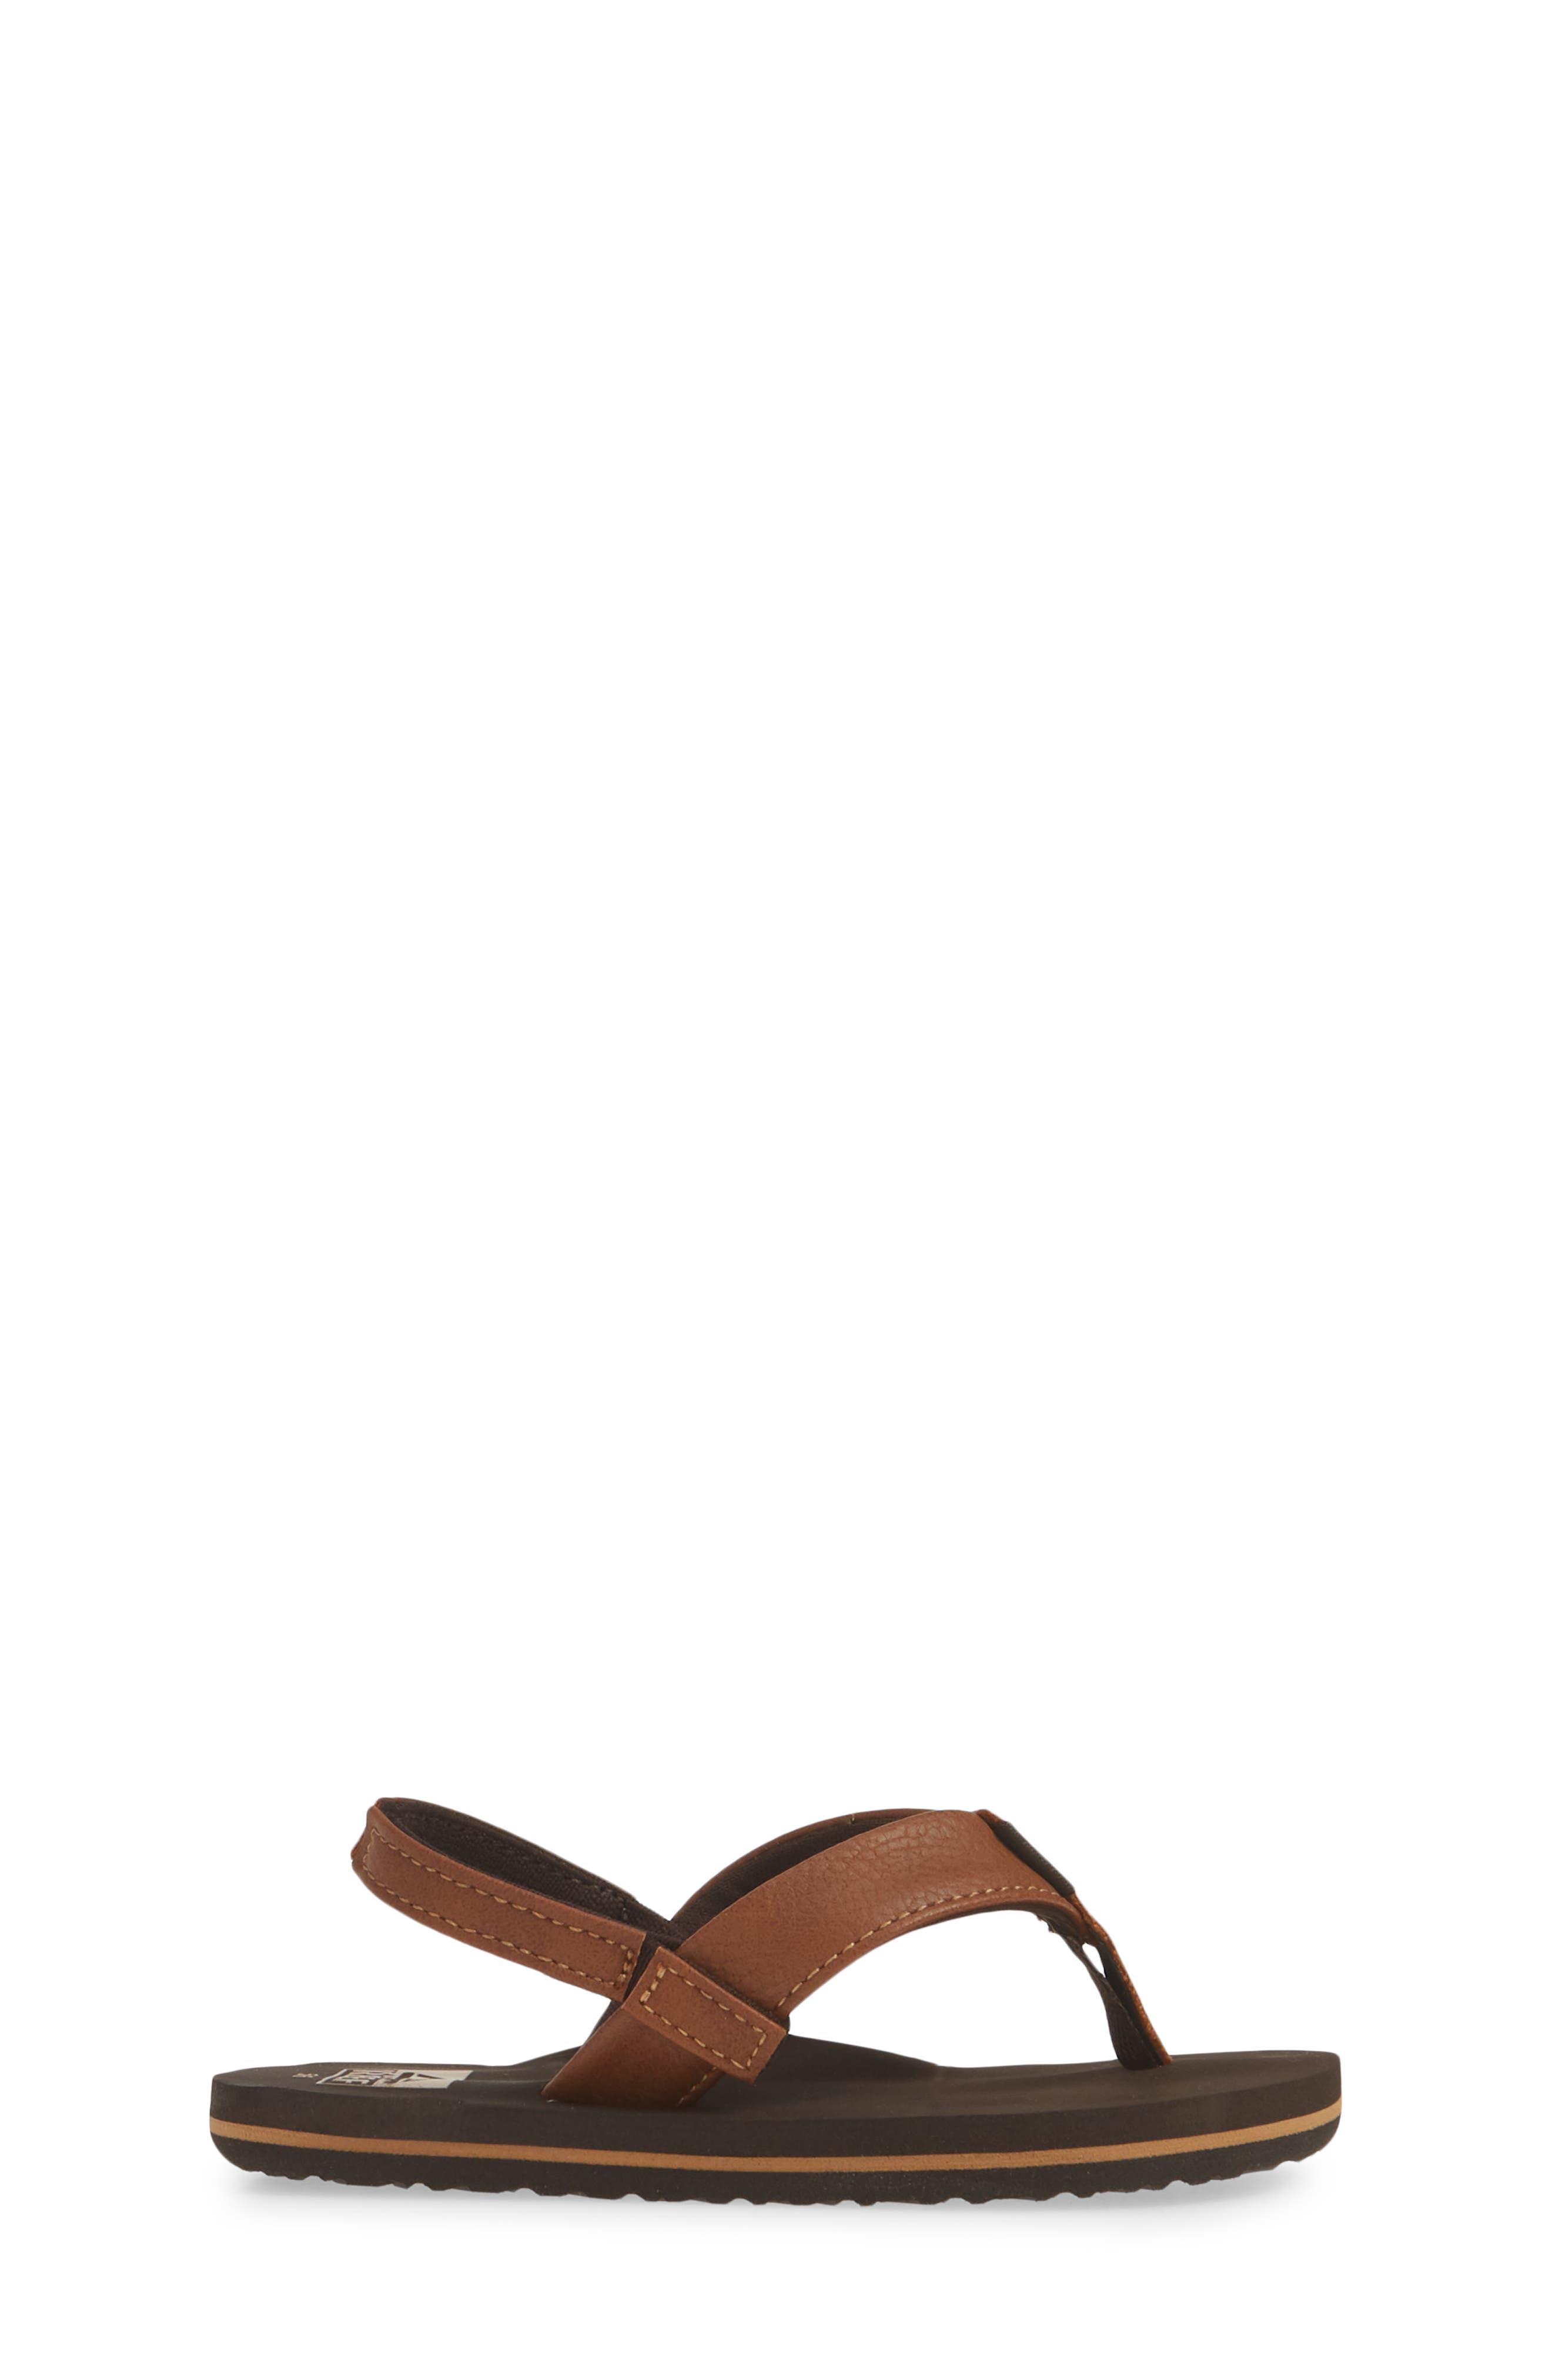 REEF, Twinpin Thong Sandal, Alternate thumbnail 3, color, BROWN